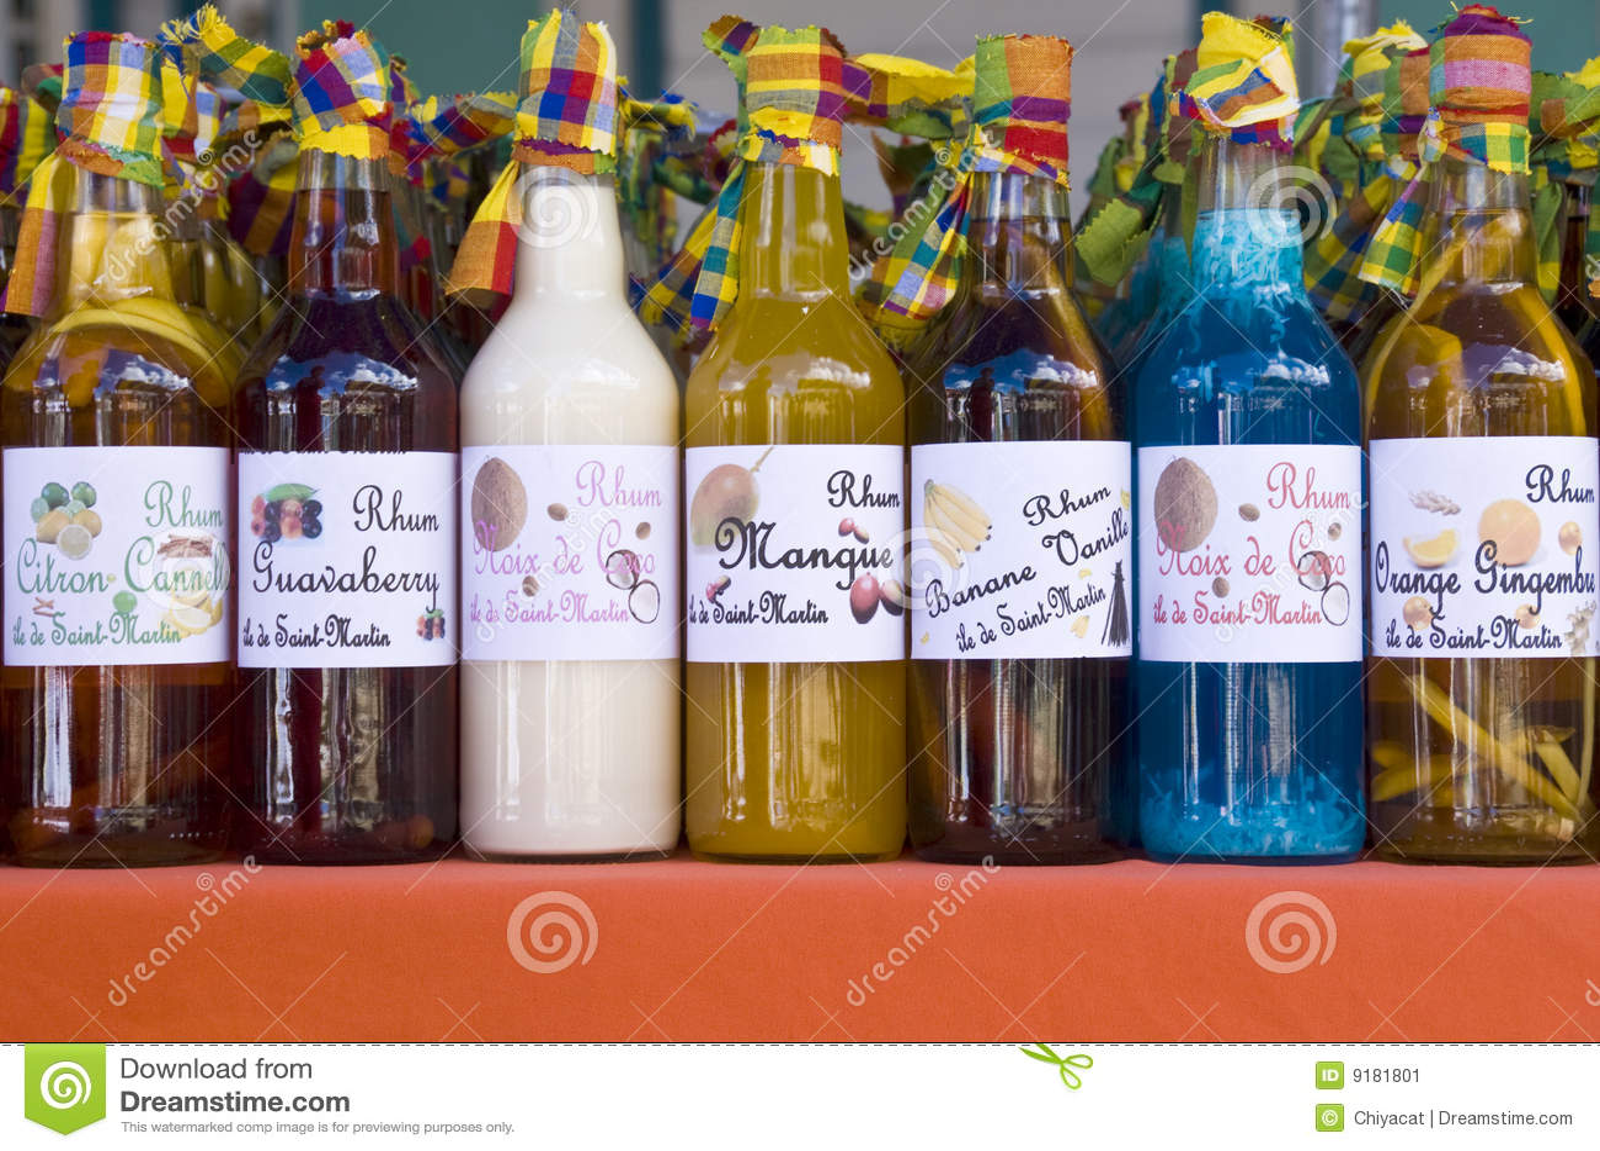 Rum Flavored